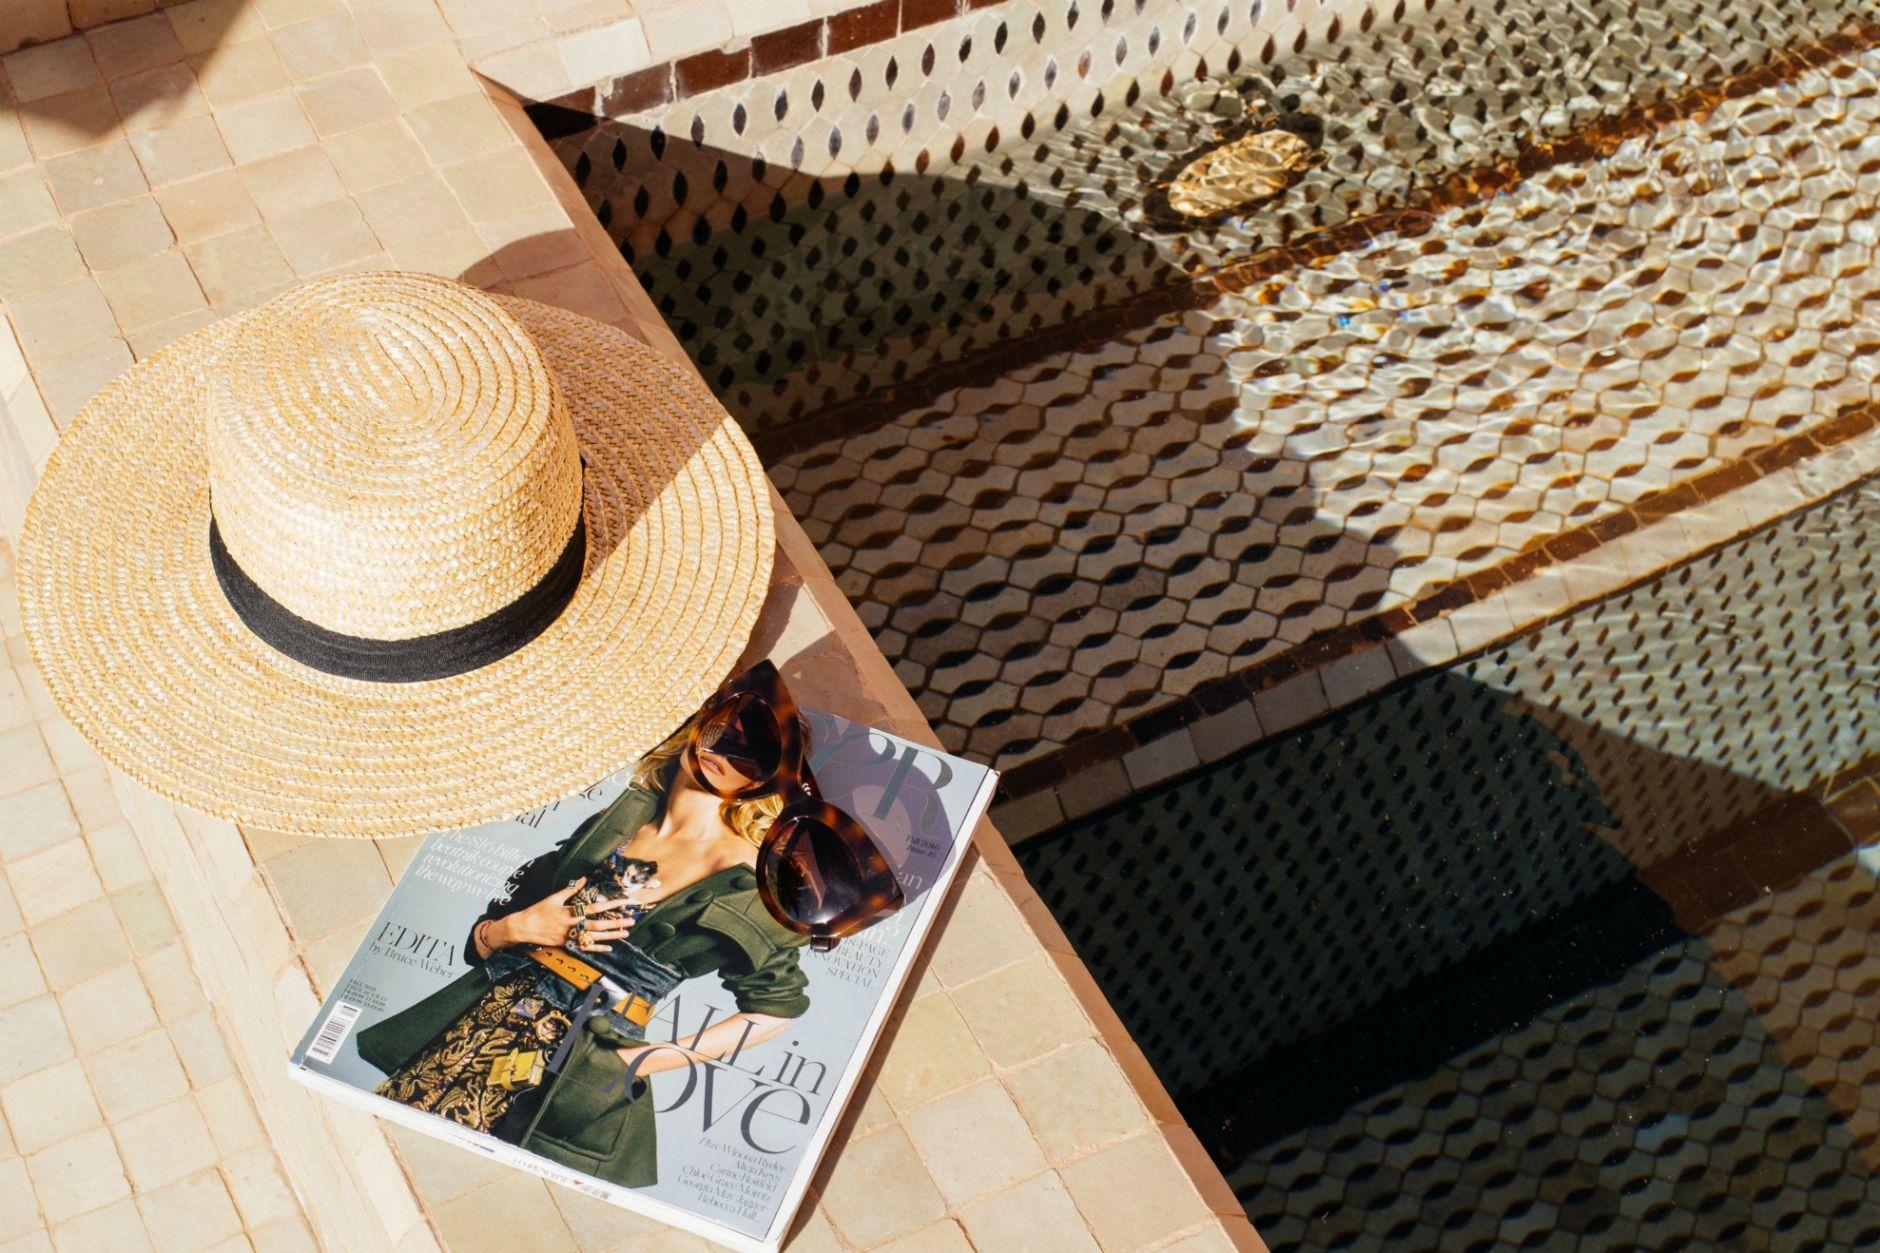 royal-mansour-hotel-luxury-marrakesch-marrakesh-morocco-edisa-shahini-disicouture-blog-59